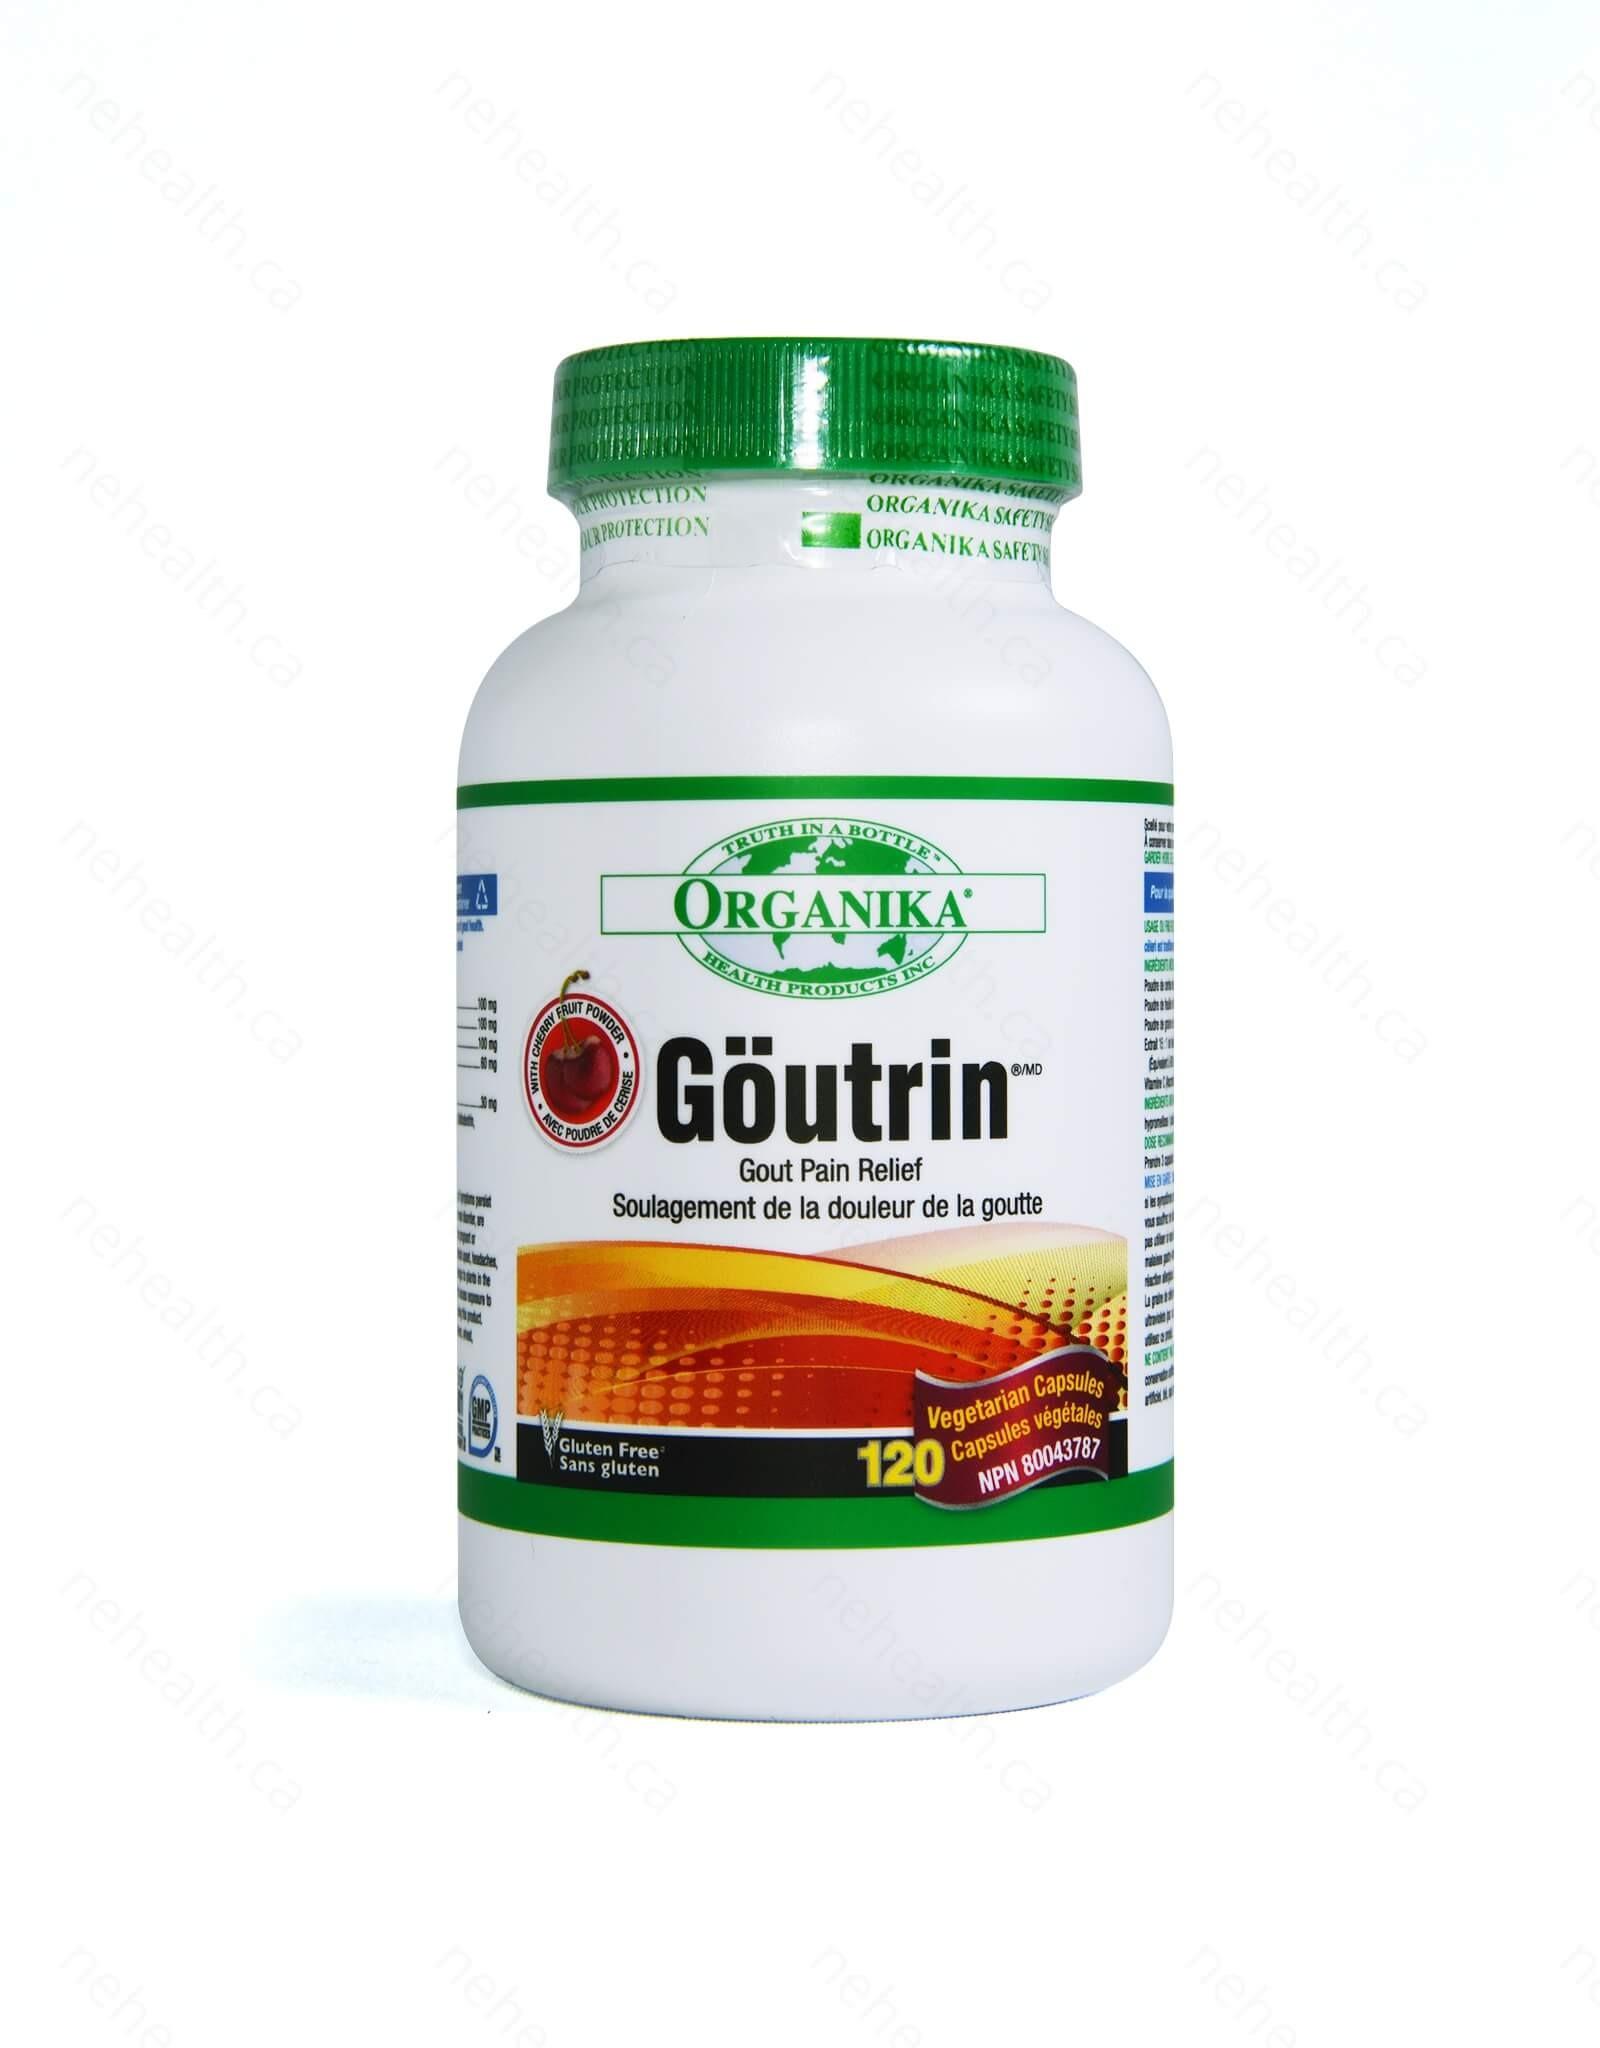 Organika Goutrin 120 Capsules